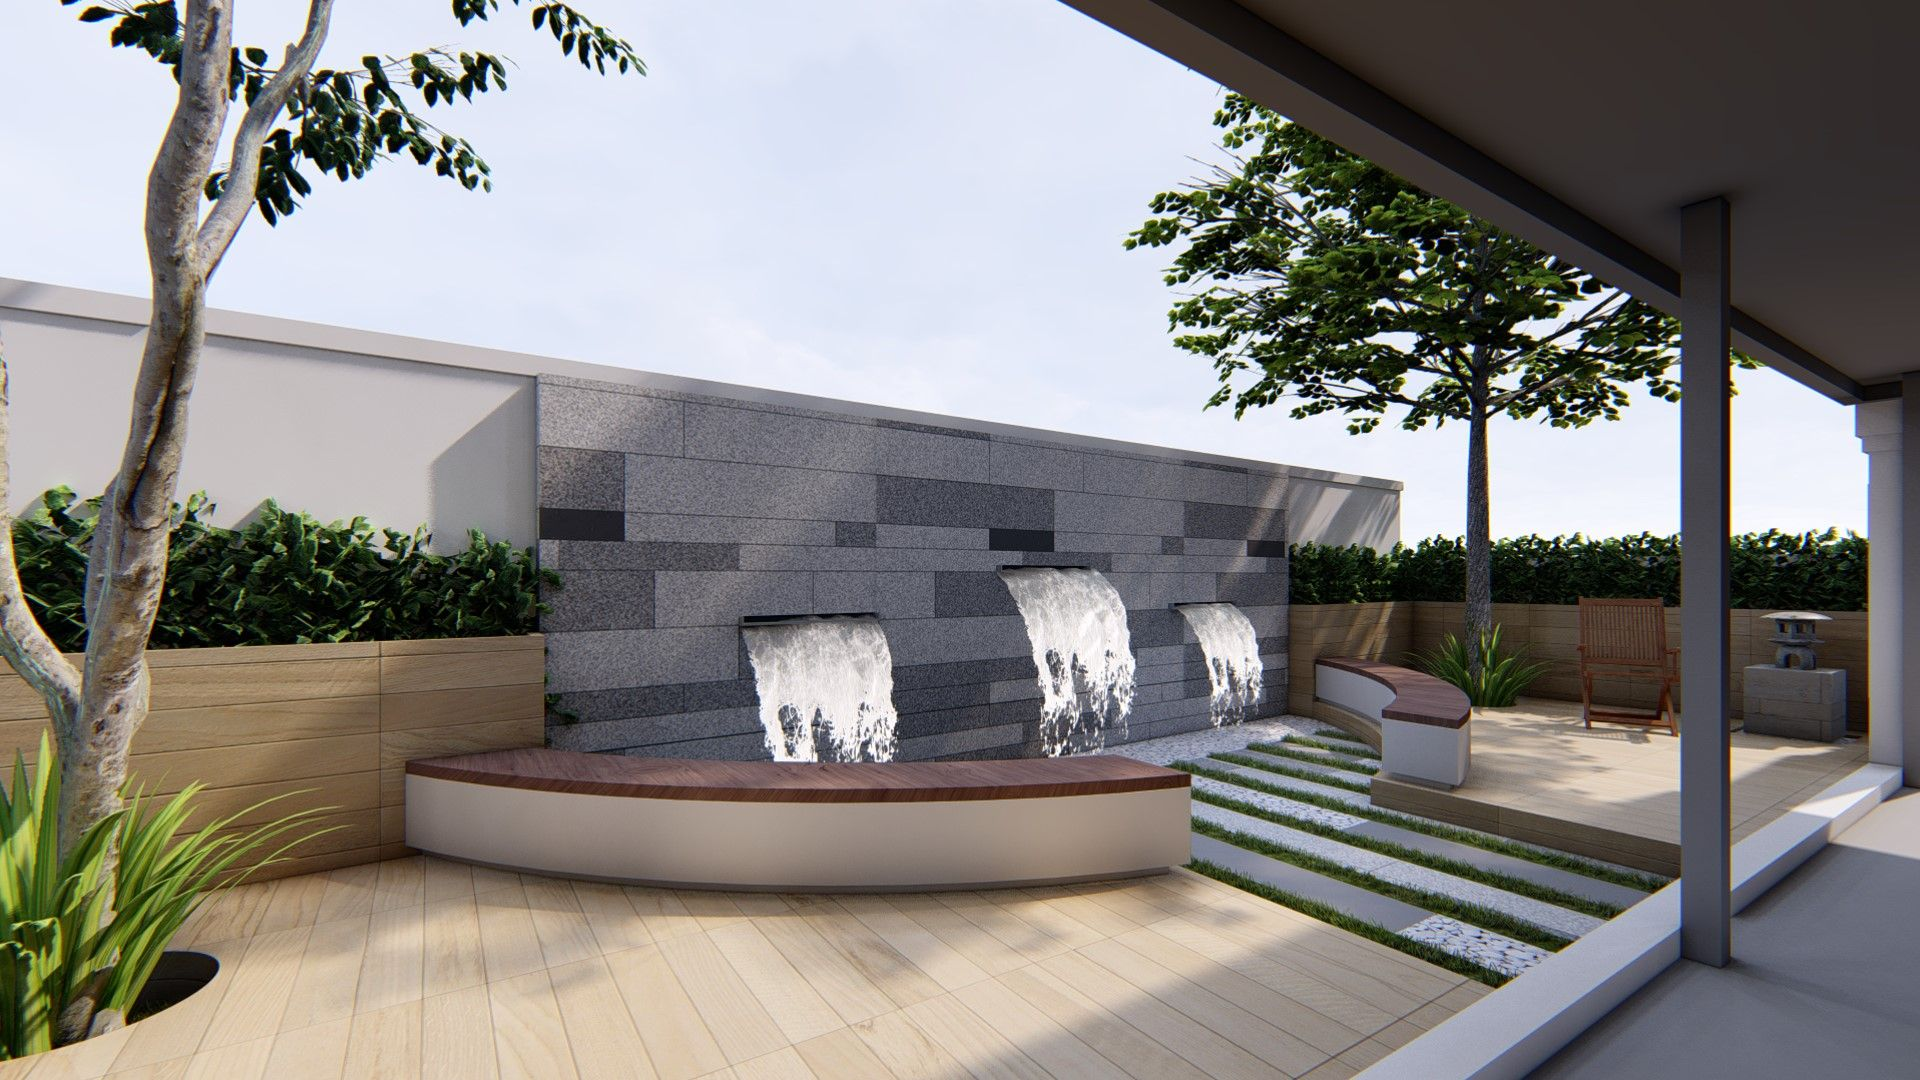 Landscape Design Perspective Water Feature Modern Landscape Urban Design Landscape Corridor And Entryway Residential Garden Private Garden Pavilion Lan